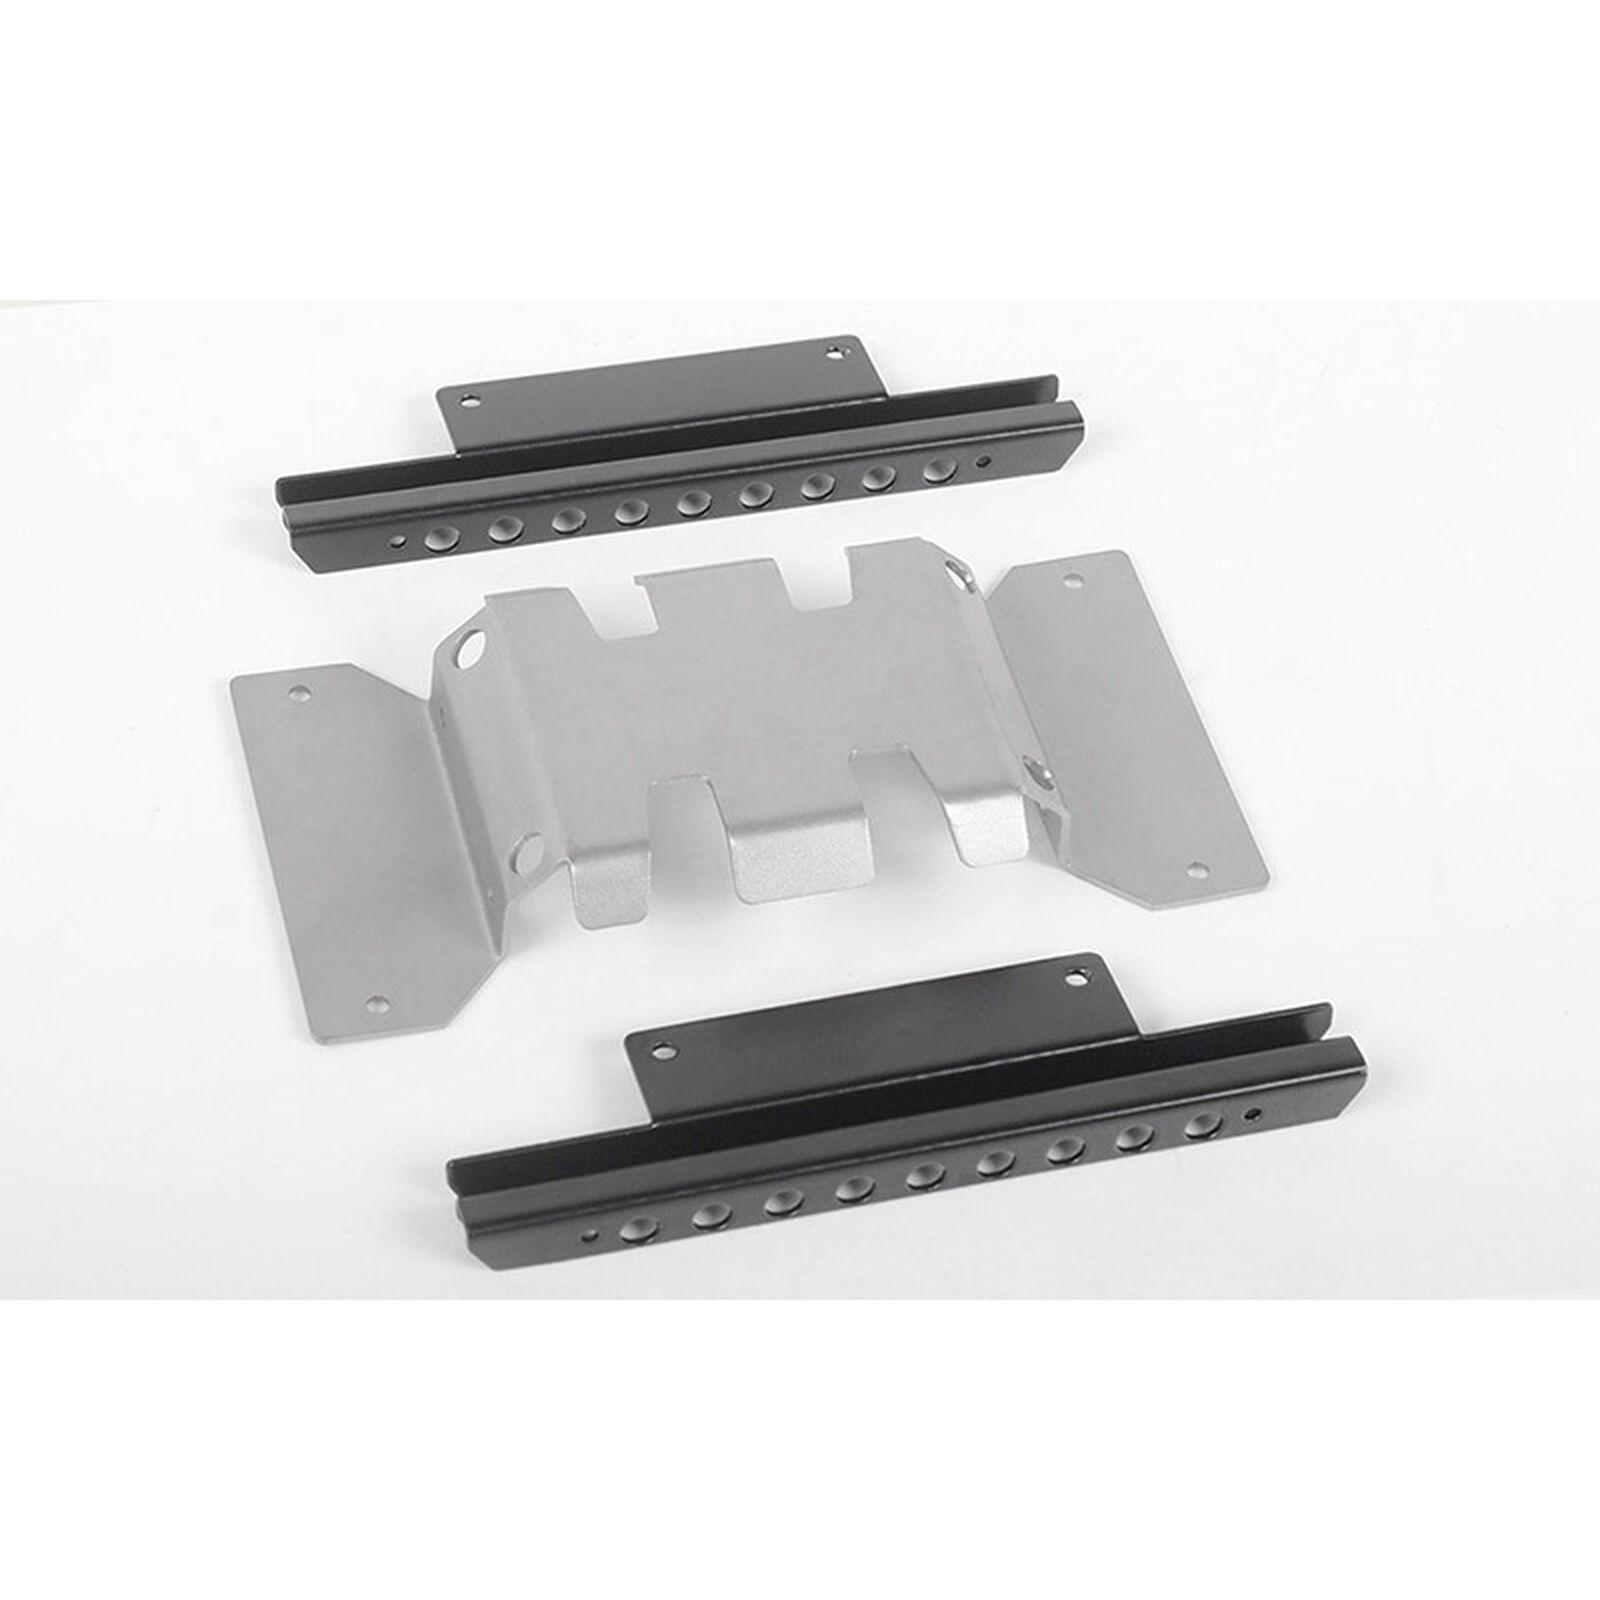 RoughStuff Skid Plate Sliders (A): MST 1/10 CMX with Jimny J3 Body